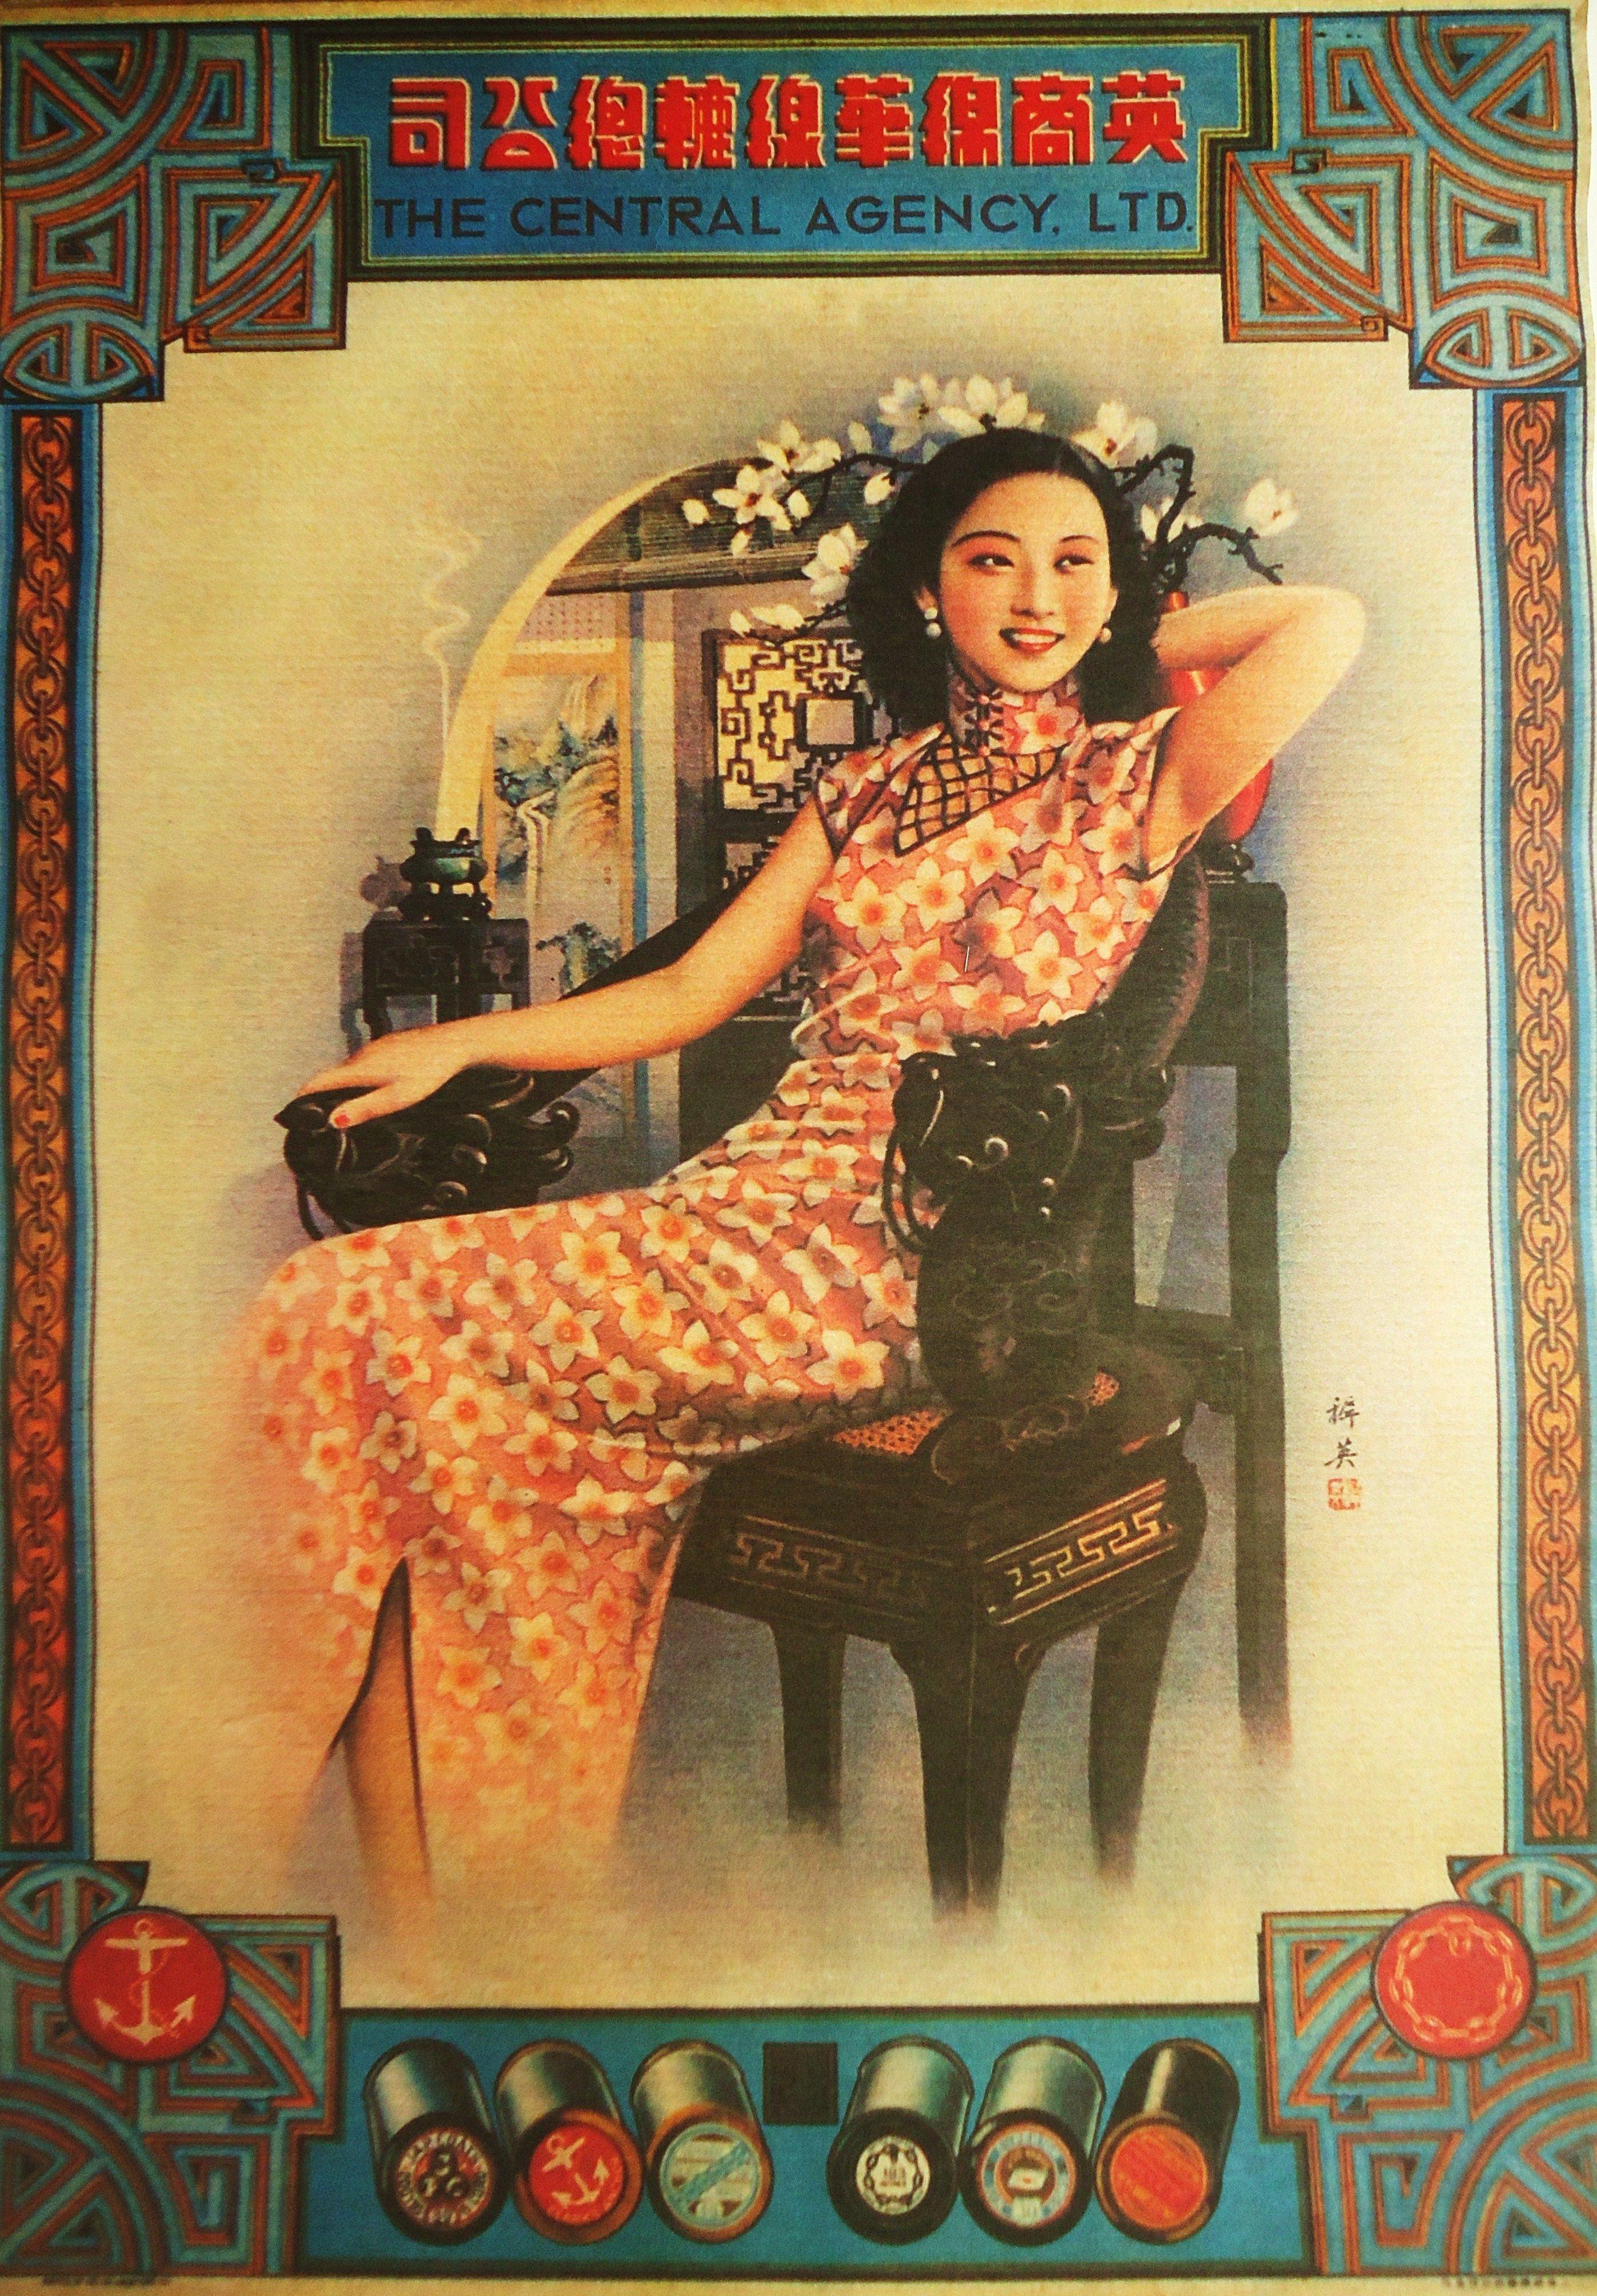 Asian Chinese Girl Happy Children Advert Poster Vintage ORIENTAL ART PRINT